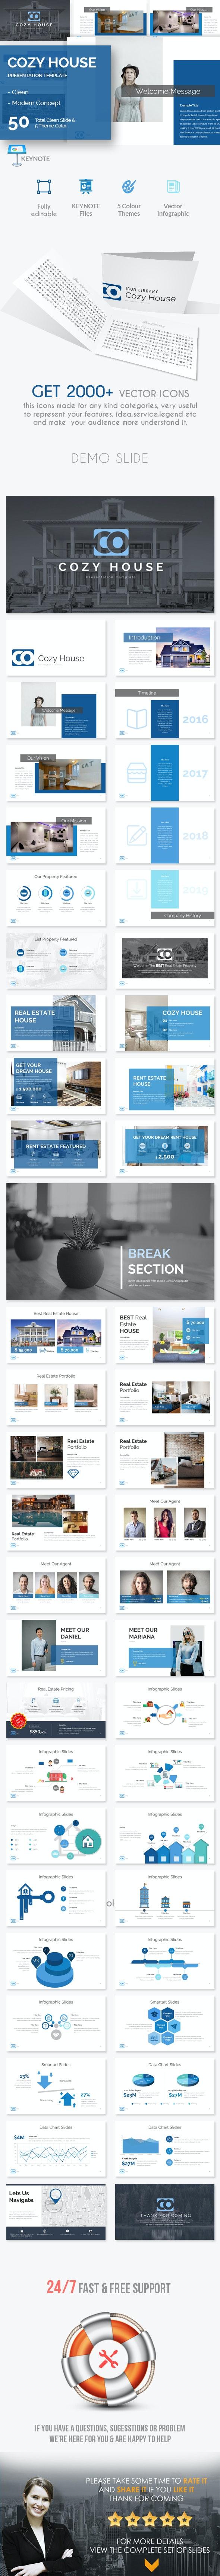 Cozy House Keynote Presentation Template - Creative Keynote Templates